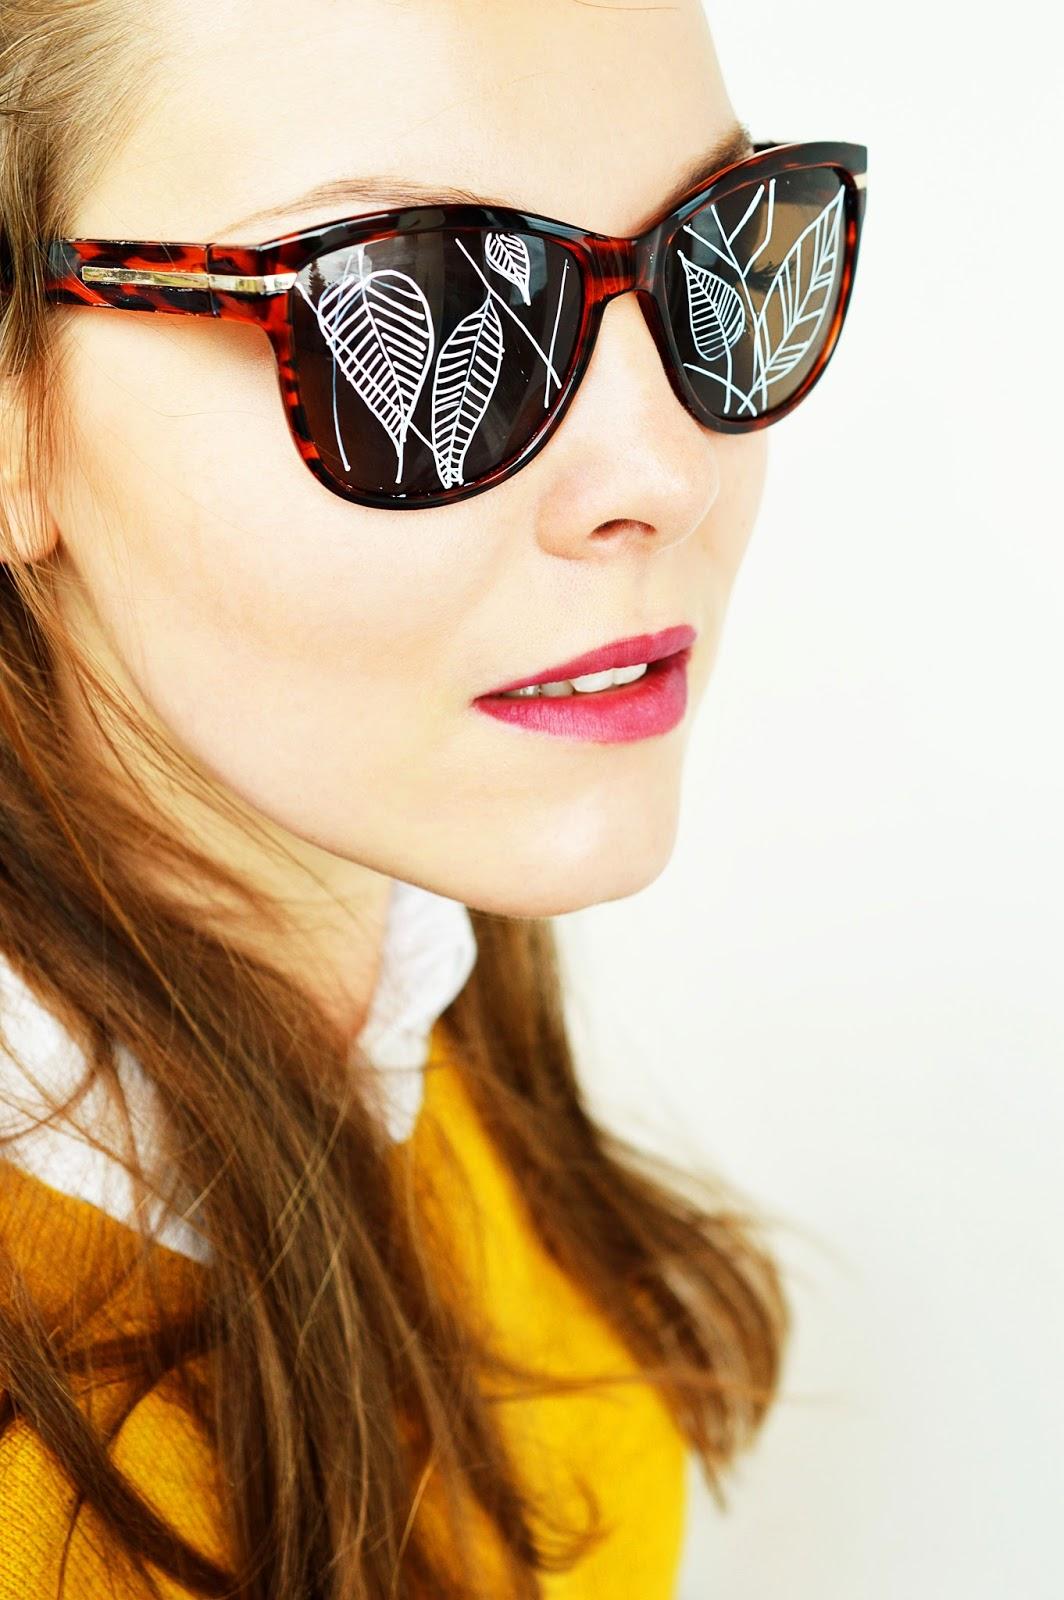 DIY Painted Sunglasses | Motte's Blog